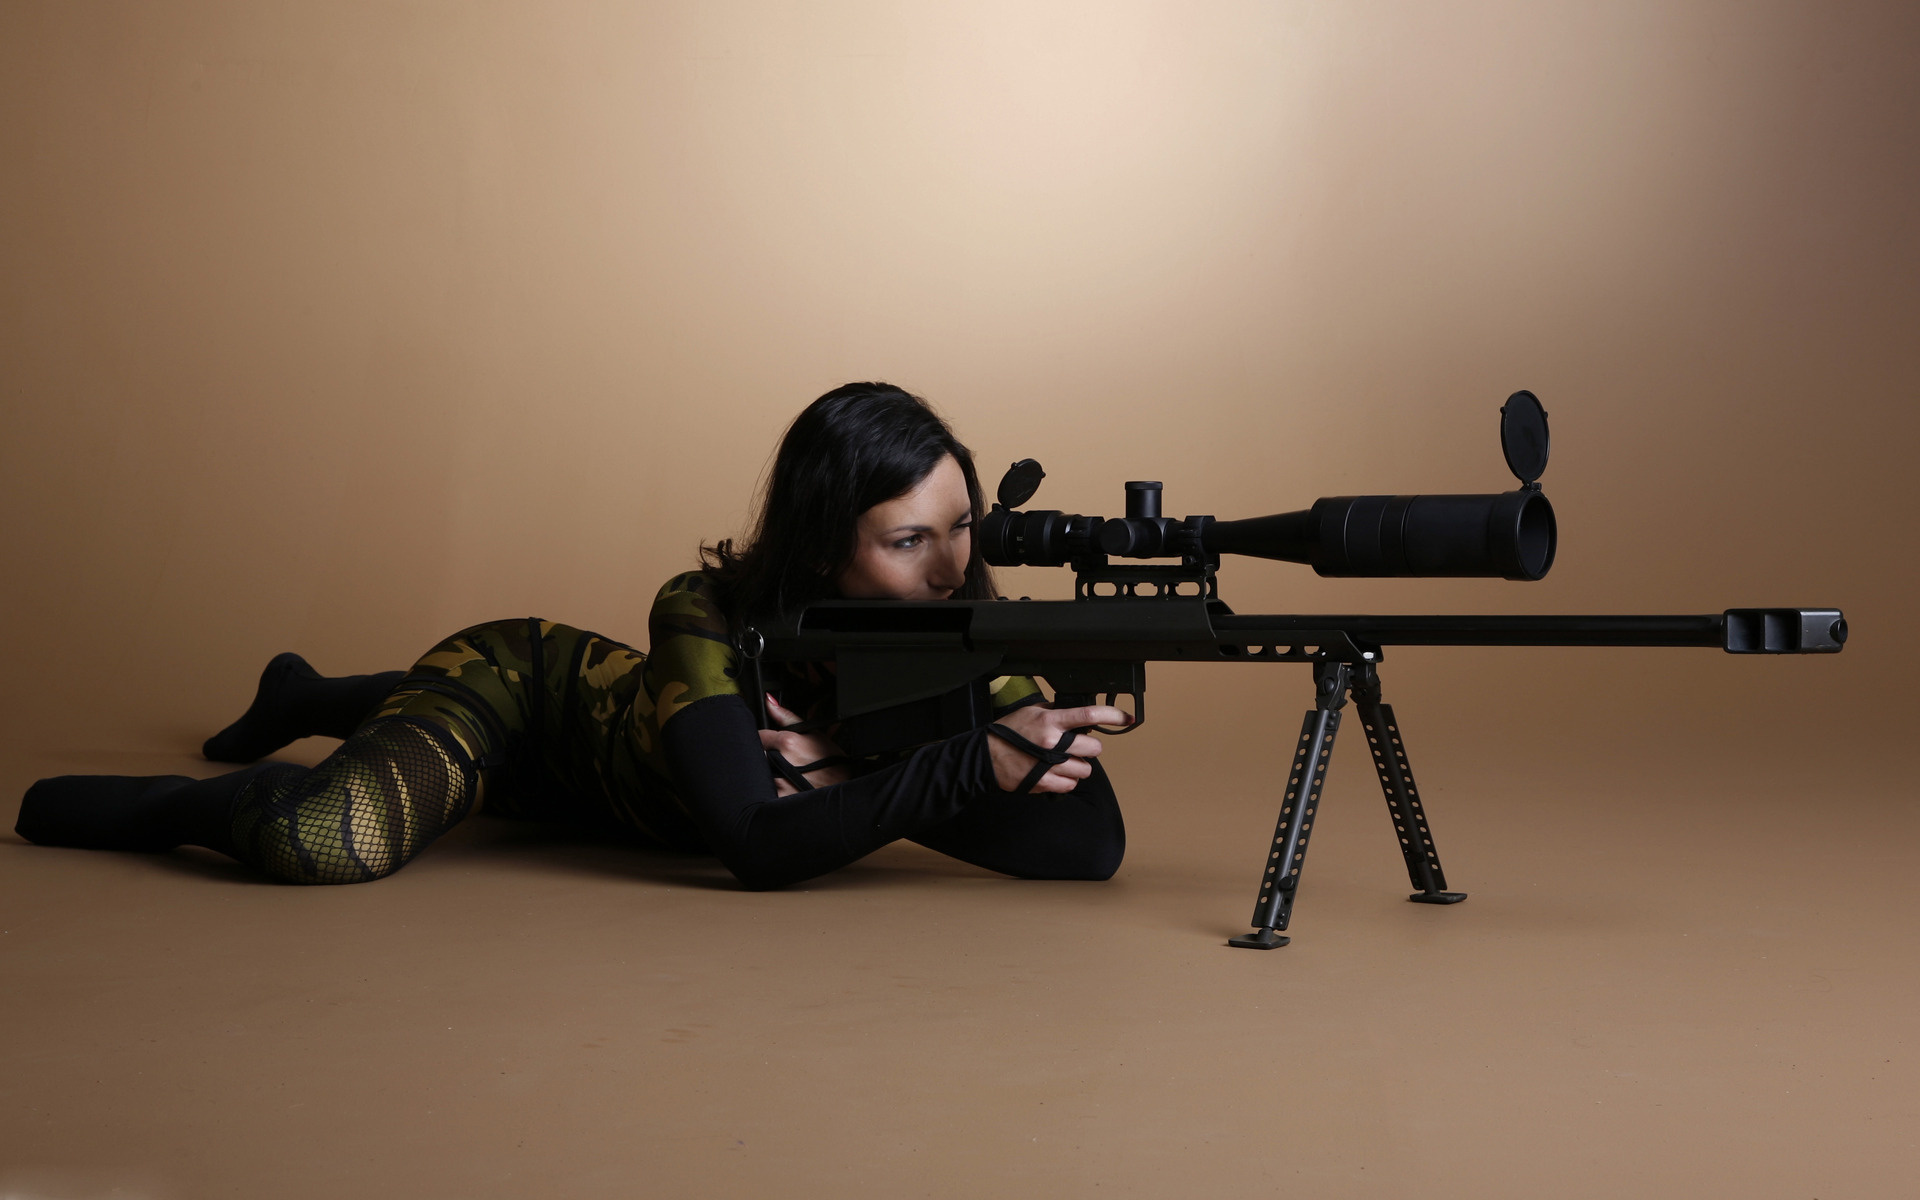 Copia di awesome sniper girl desktop background wallpaper